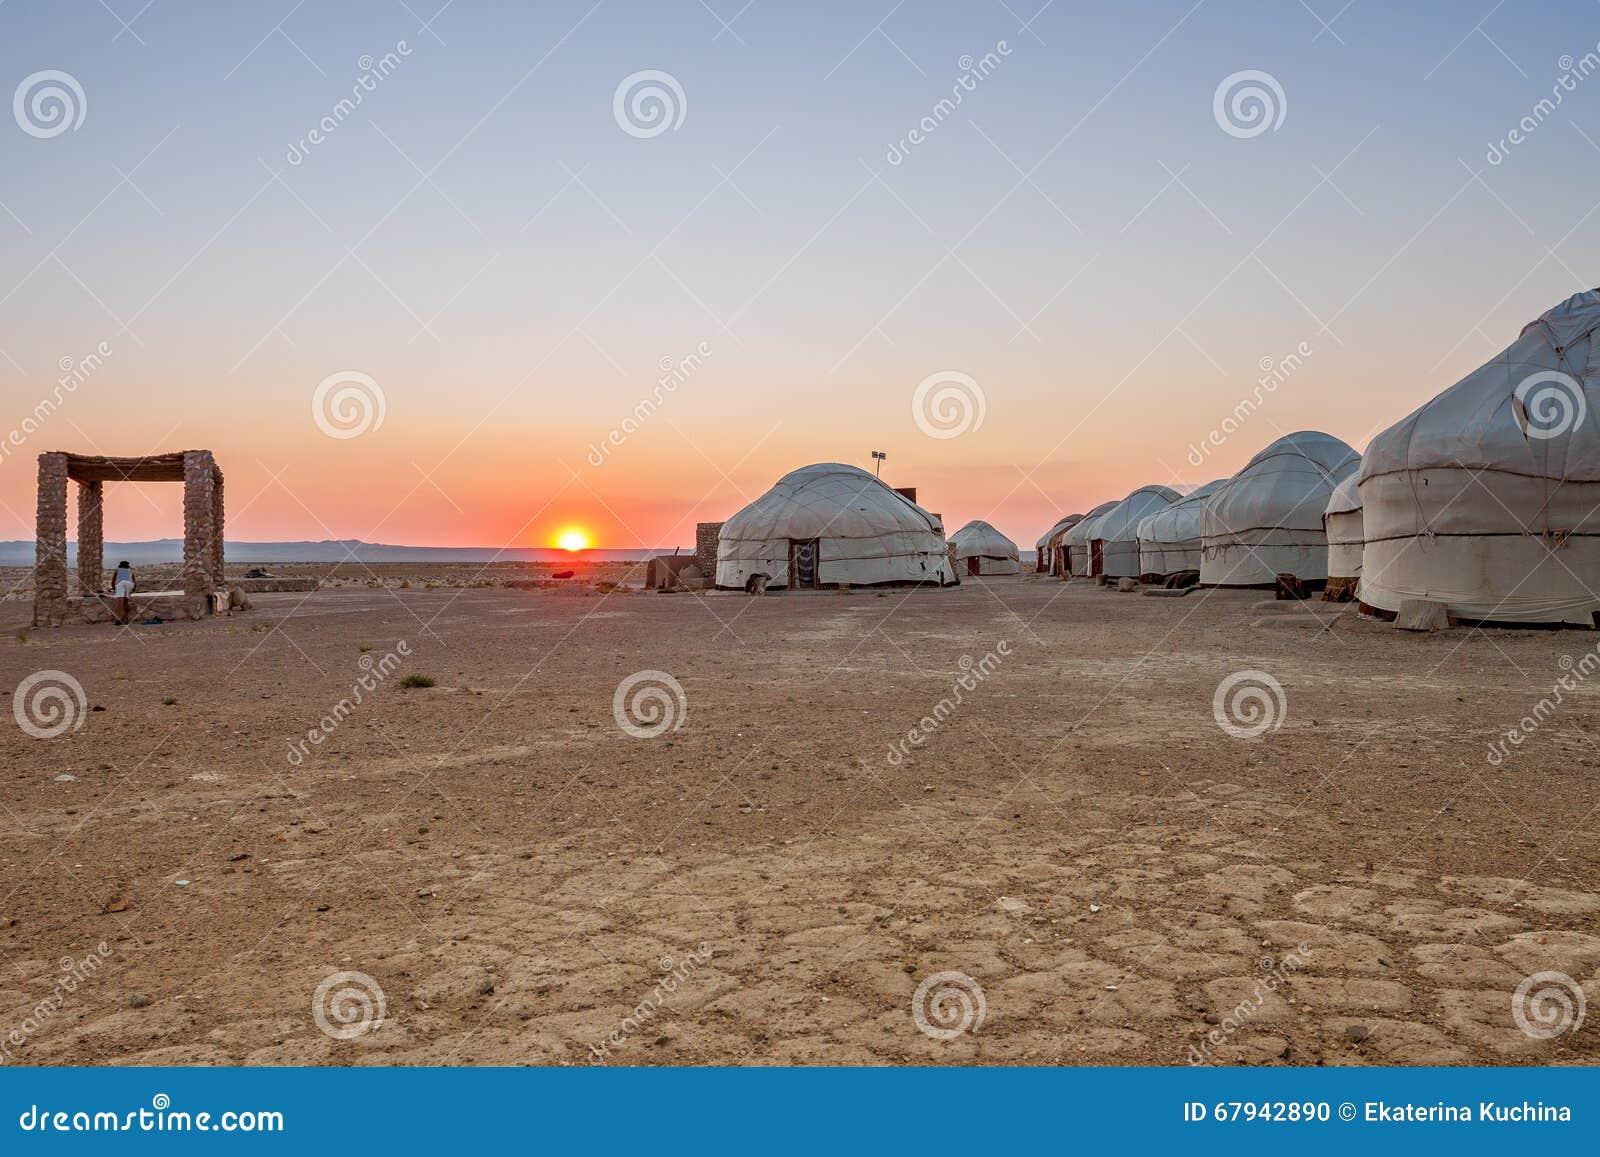 Yurts在日落的沙漠 乌兹别克斯坦